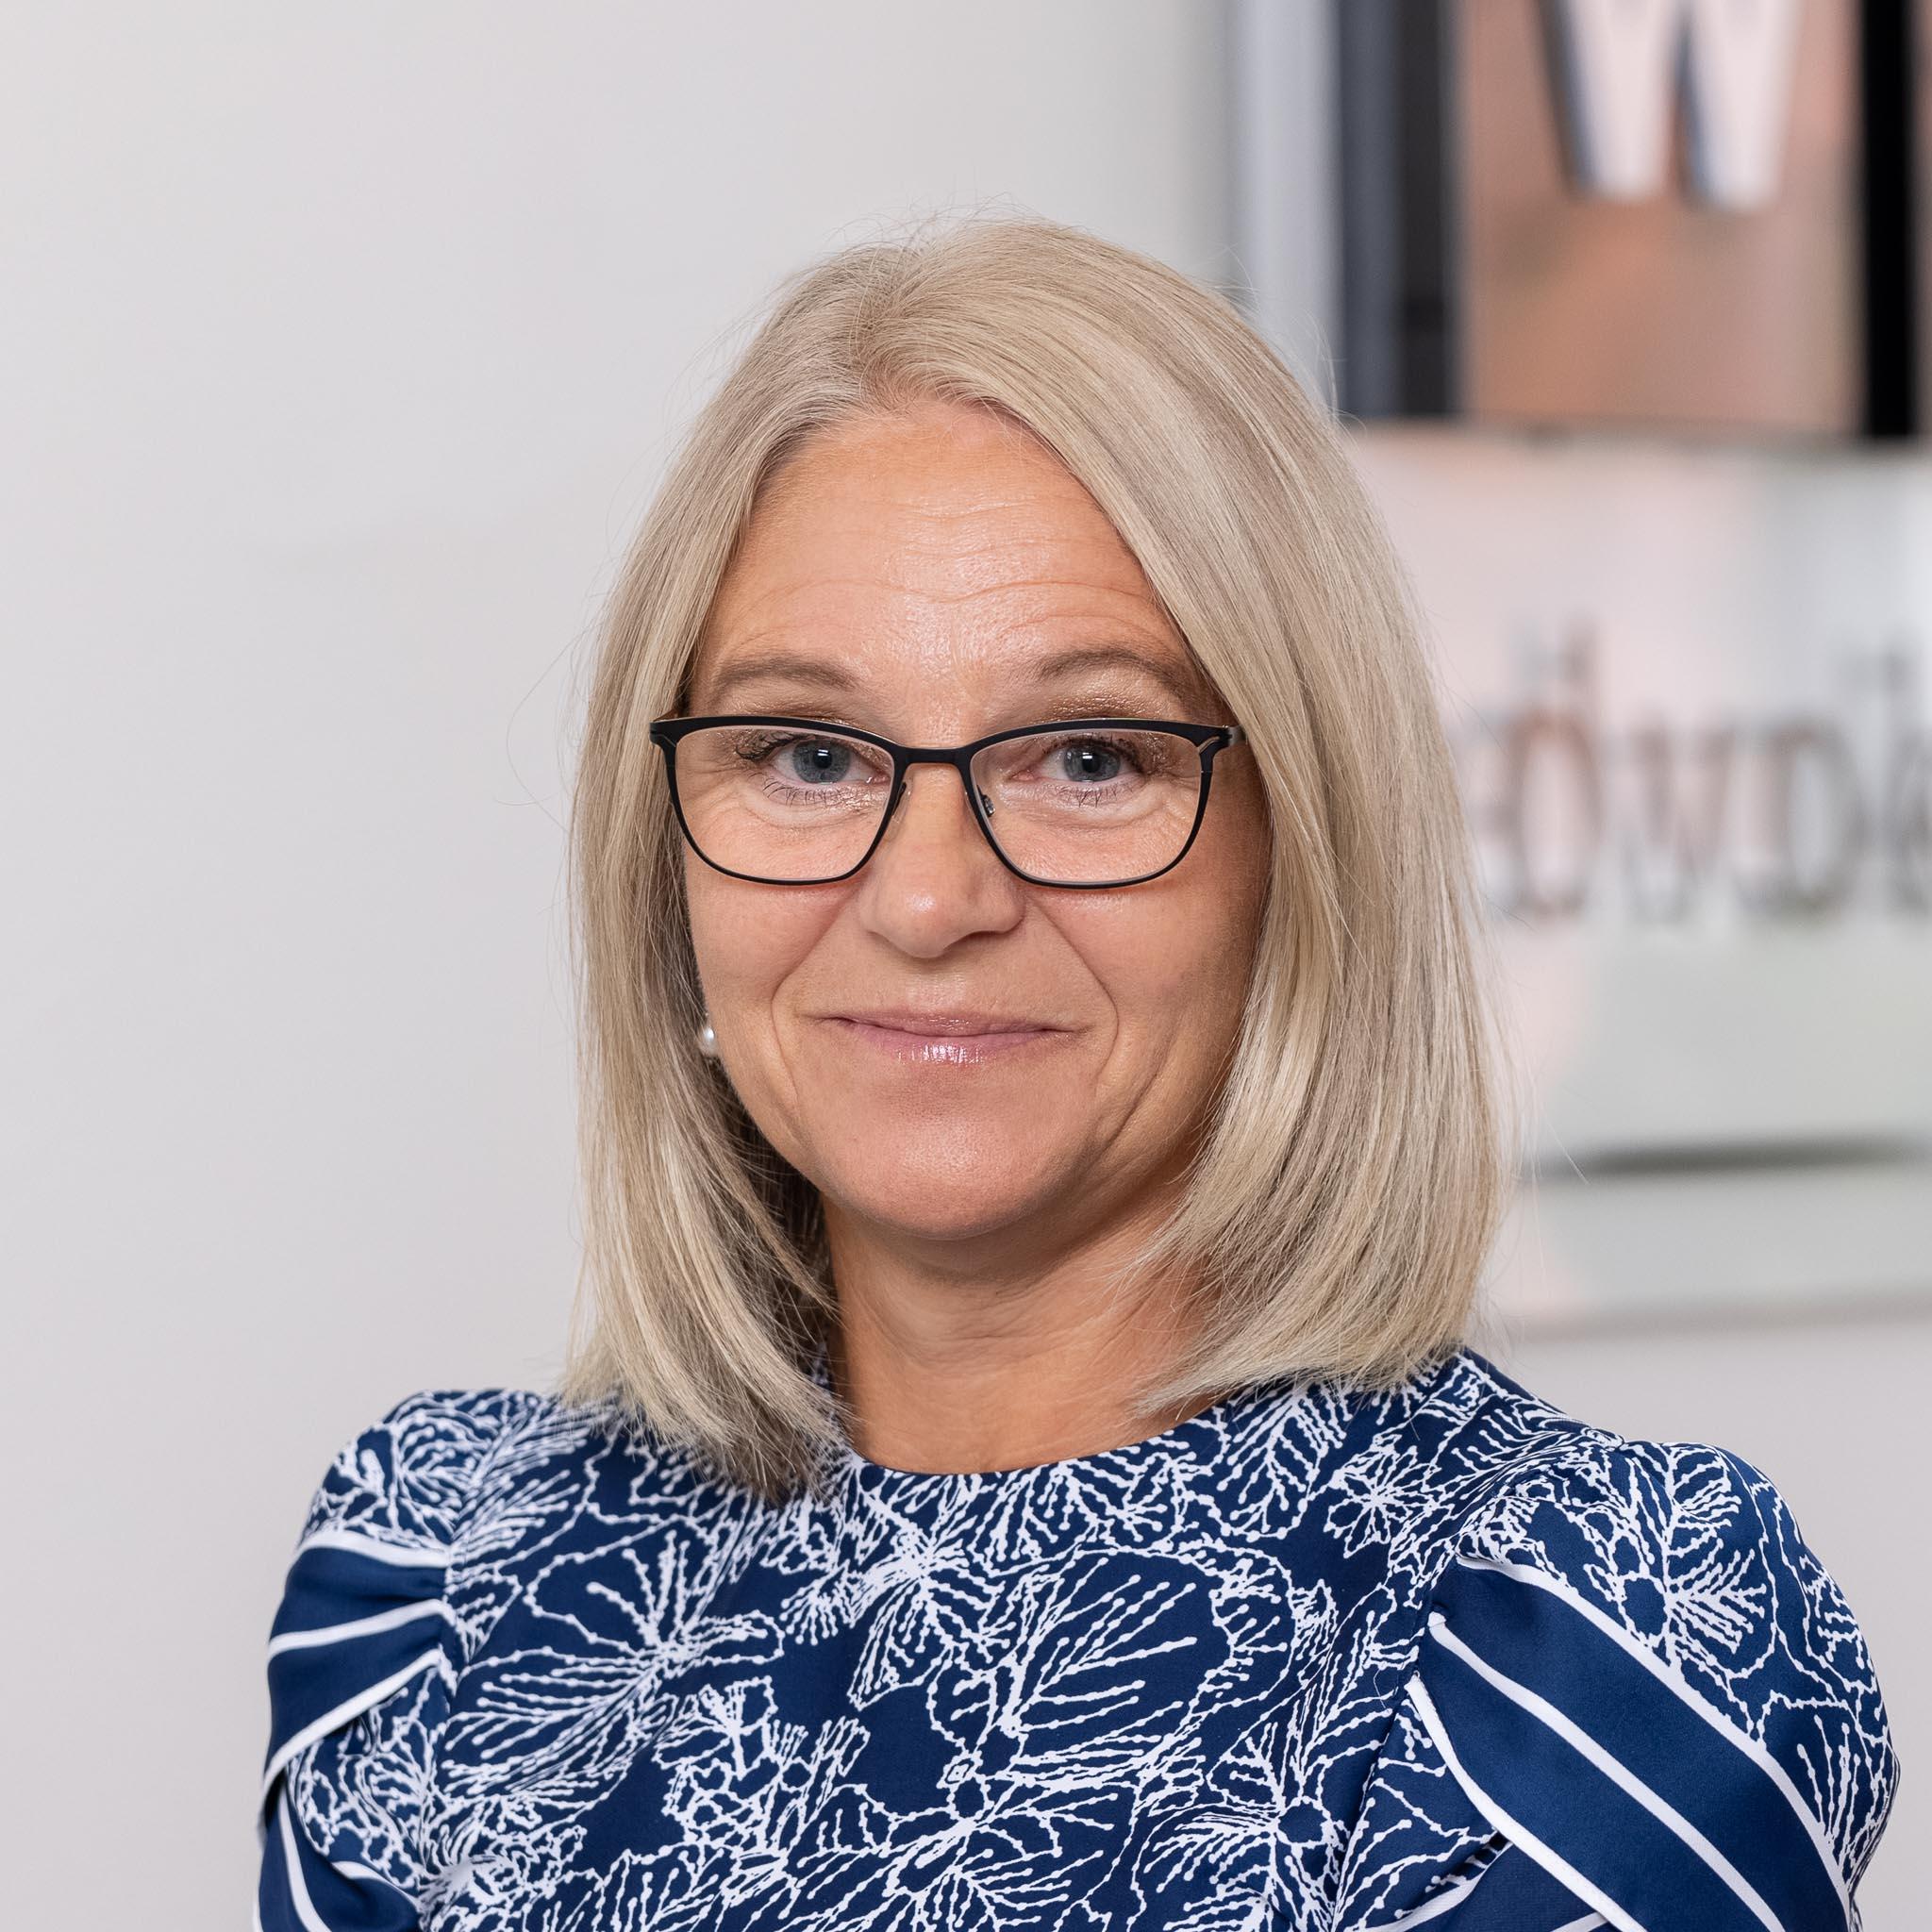 Pia Lodberg